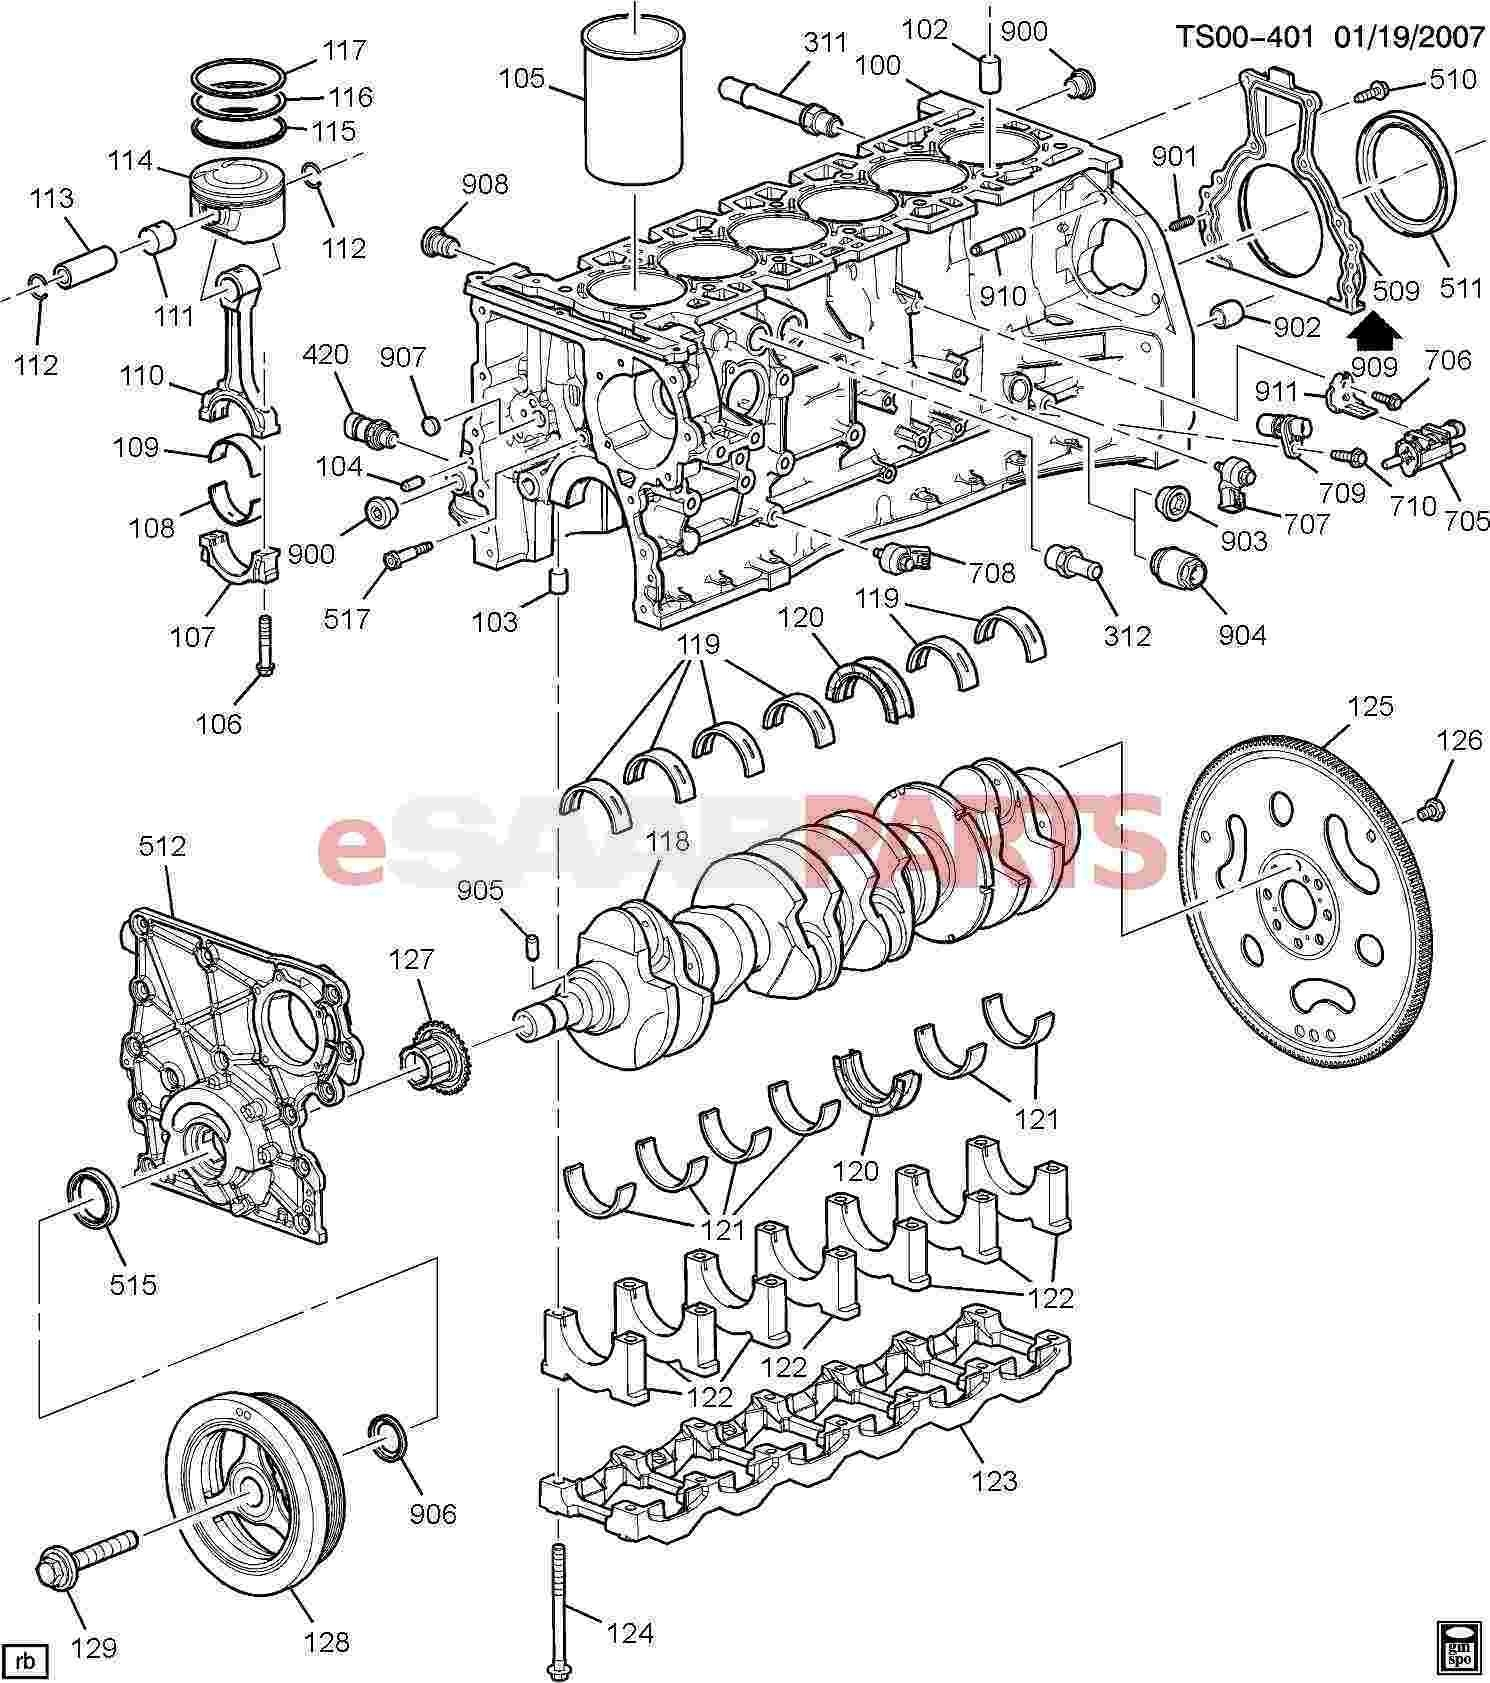 Lexus Es300 Engine Diagram 98 Toyota Ta A Wiring Auto Parts Of